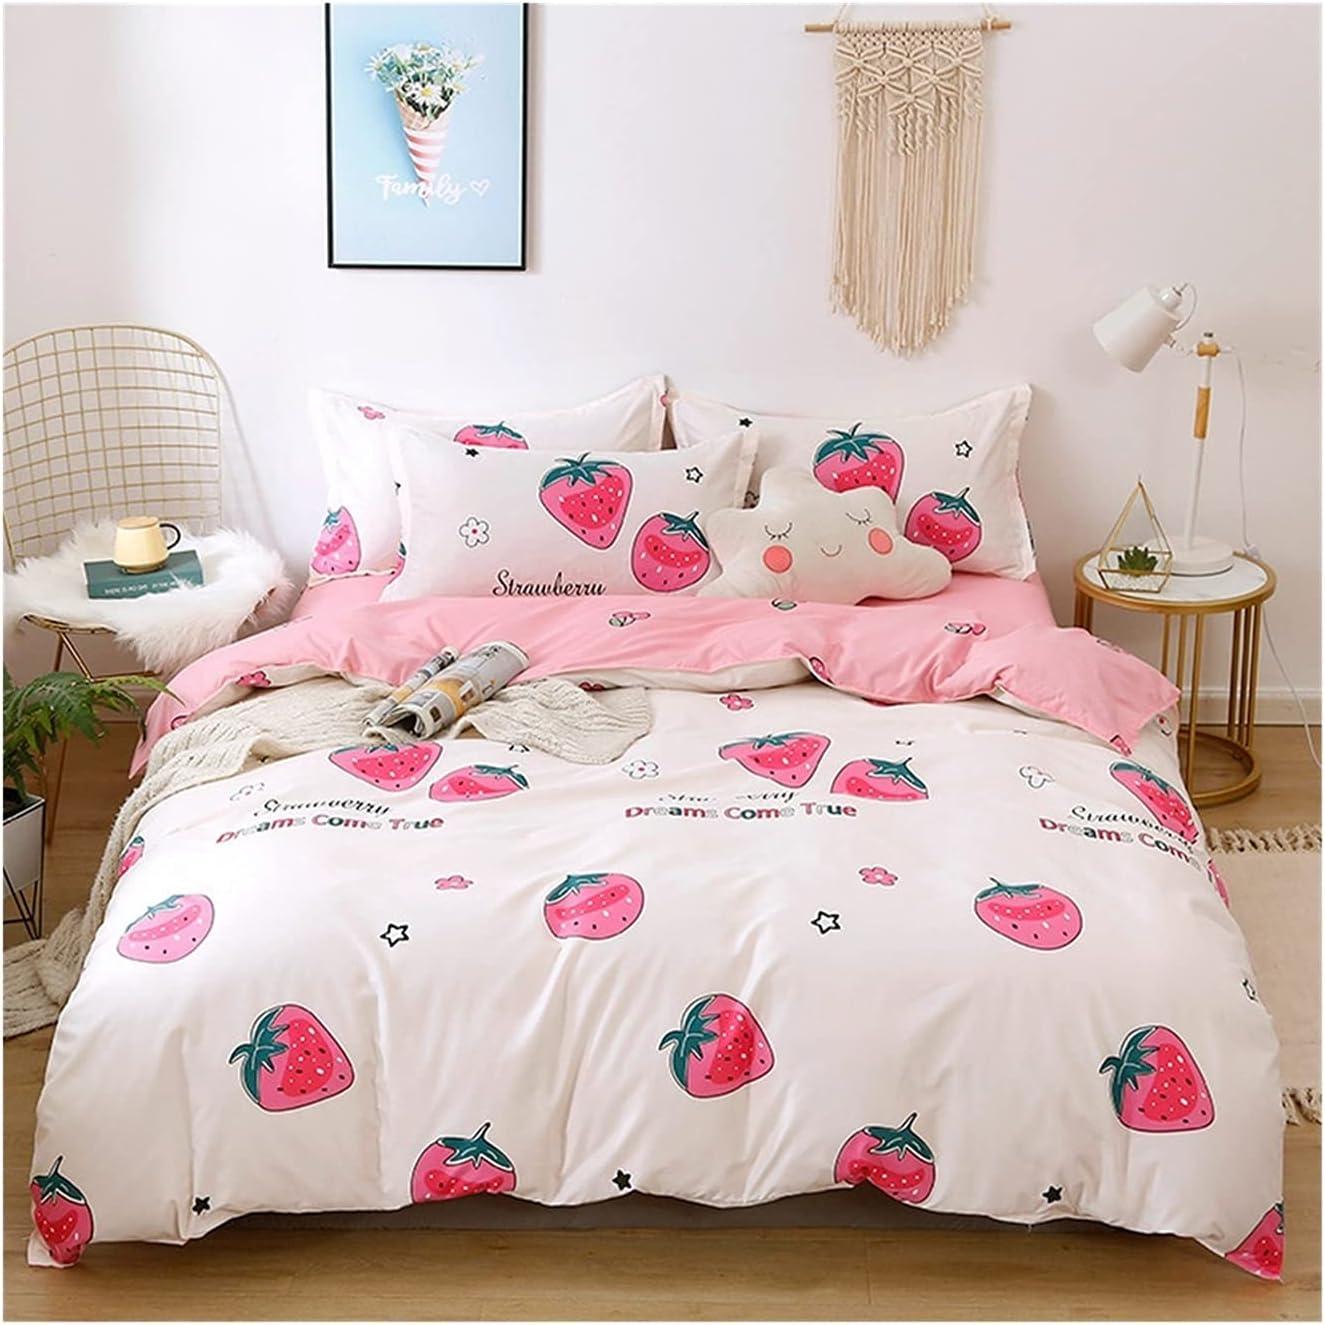 Ranking TOP3 LSDJ QMDSH Home Textile Girl Bedding Peach Gifts Set Duvet Cover Pink